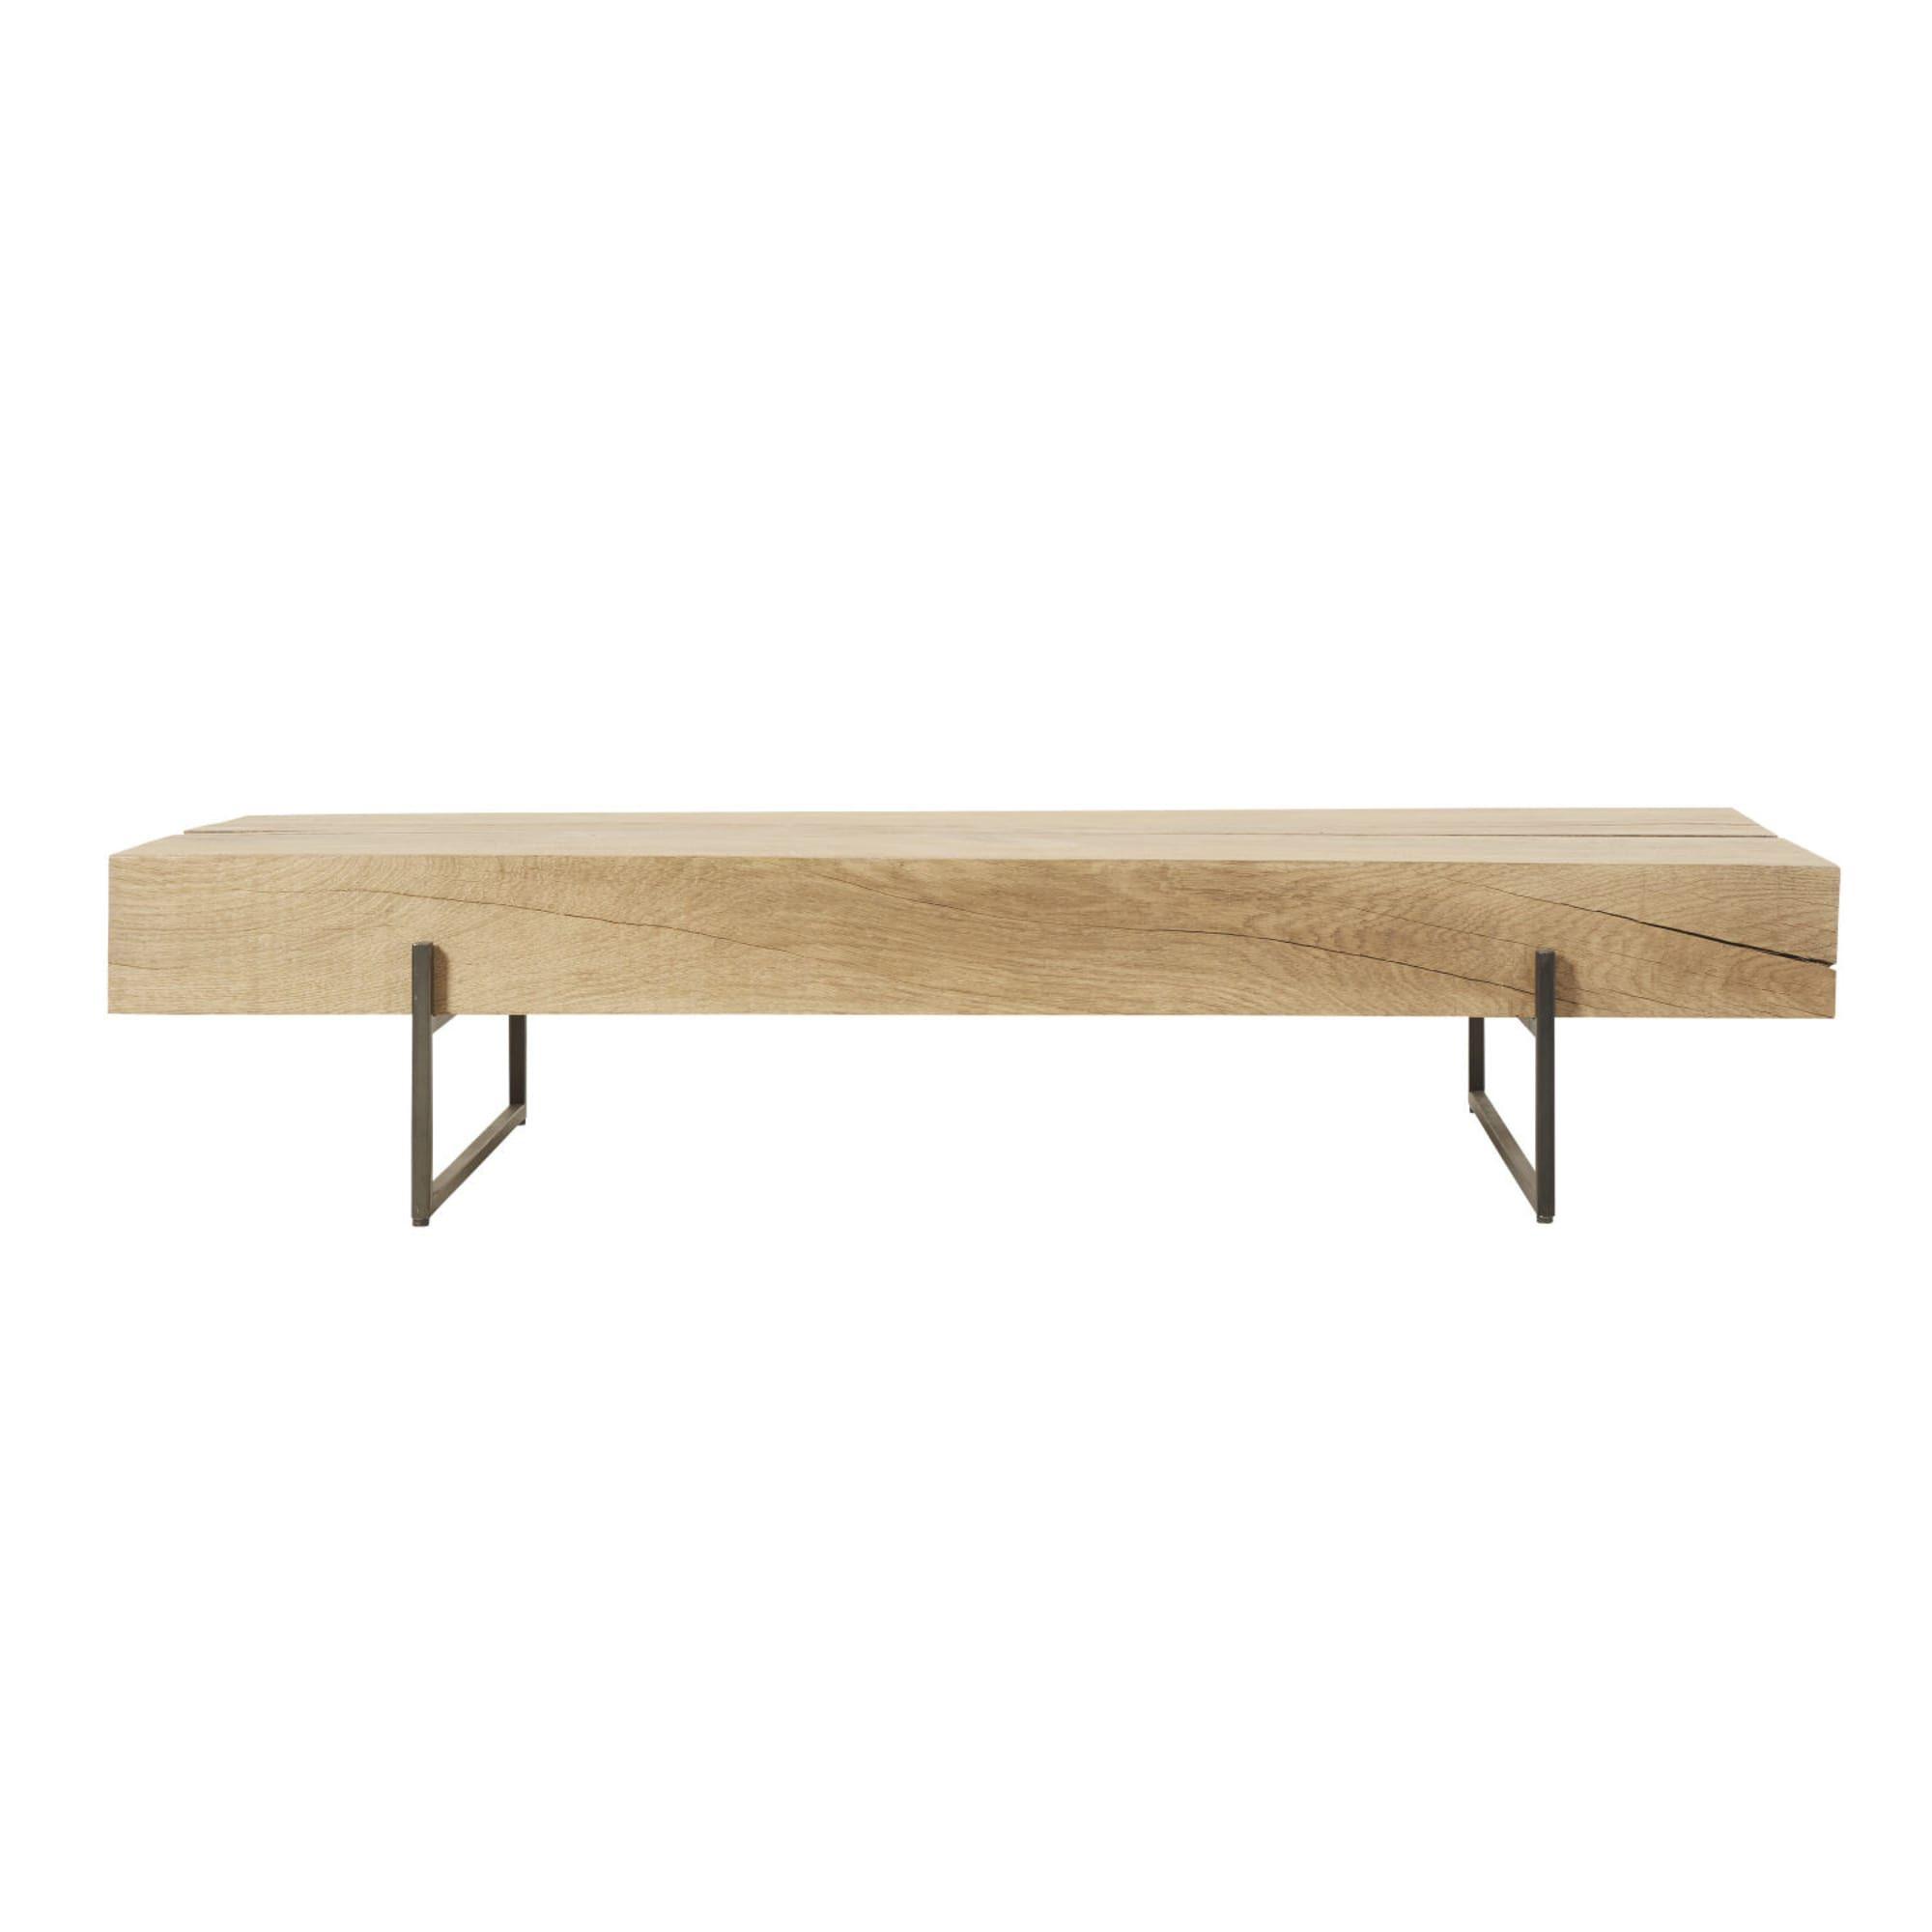 massif métal Table chêne en basse noir 2019Table et en zqUVGLSMjp